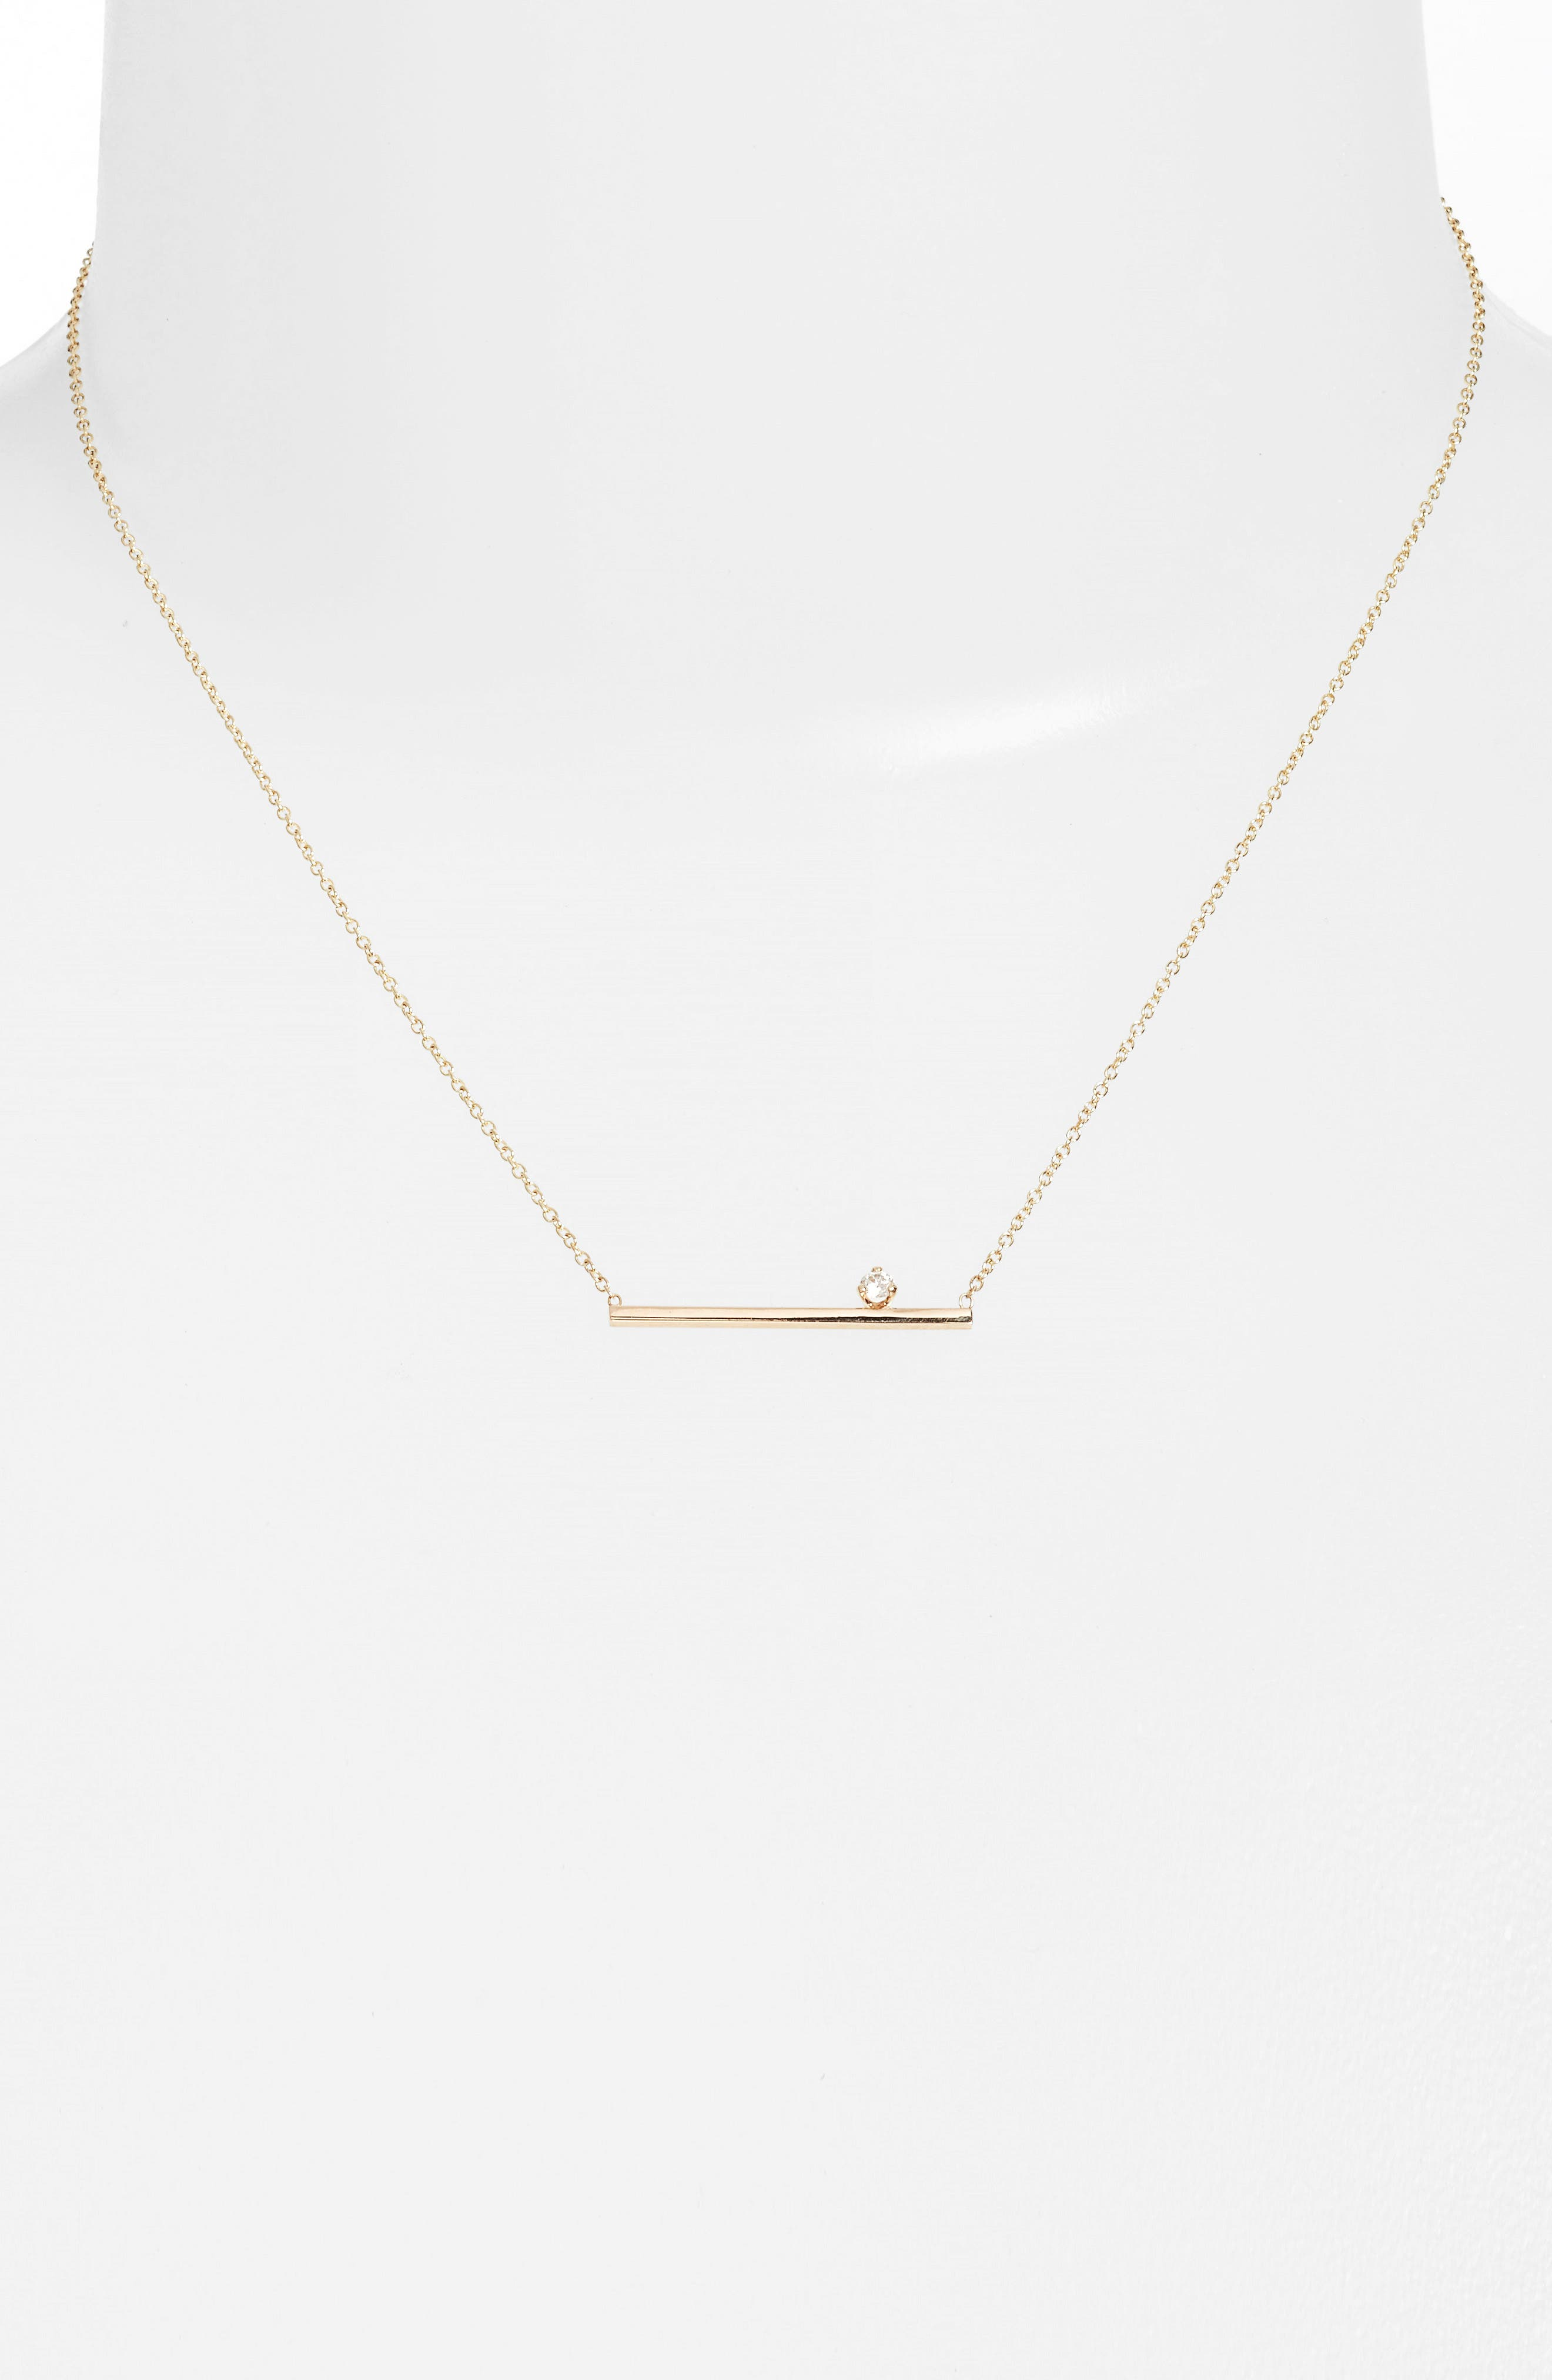 Floating Diamond Pendant Necklace,                             Alternate thumbnail 2, color,                             710